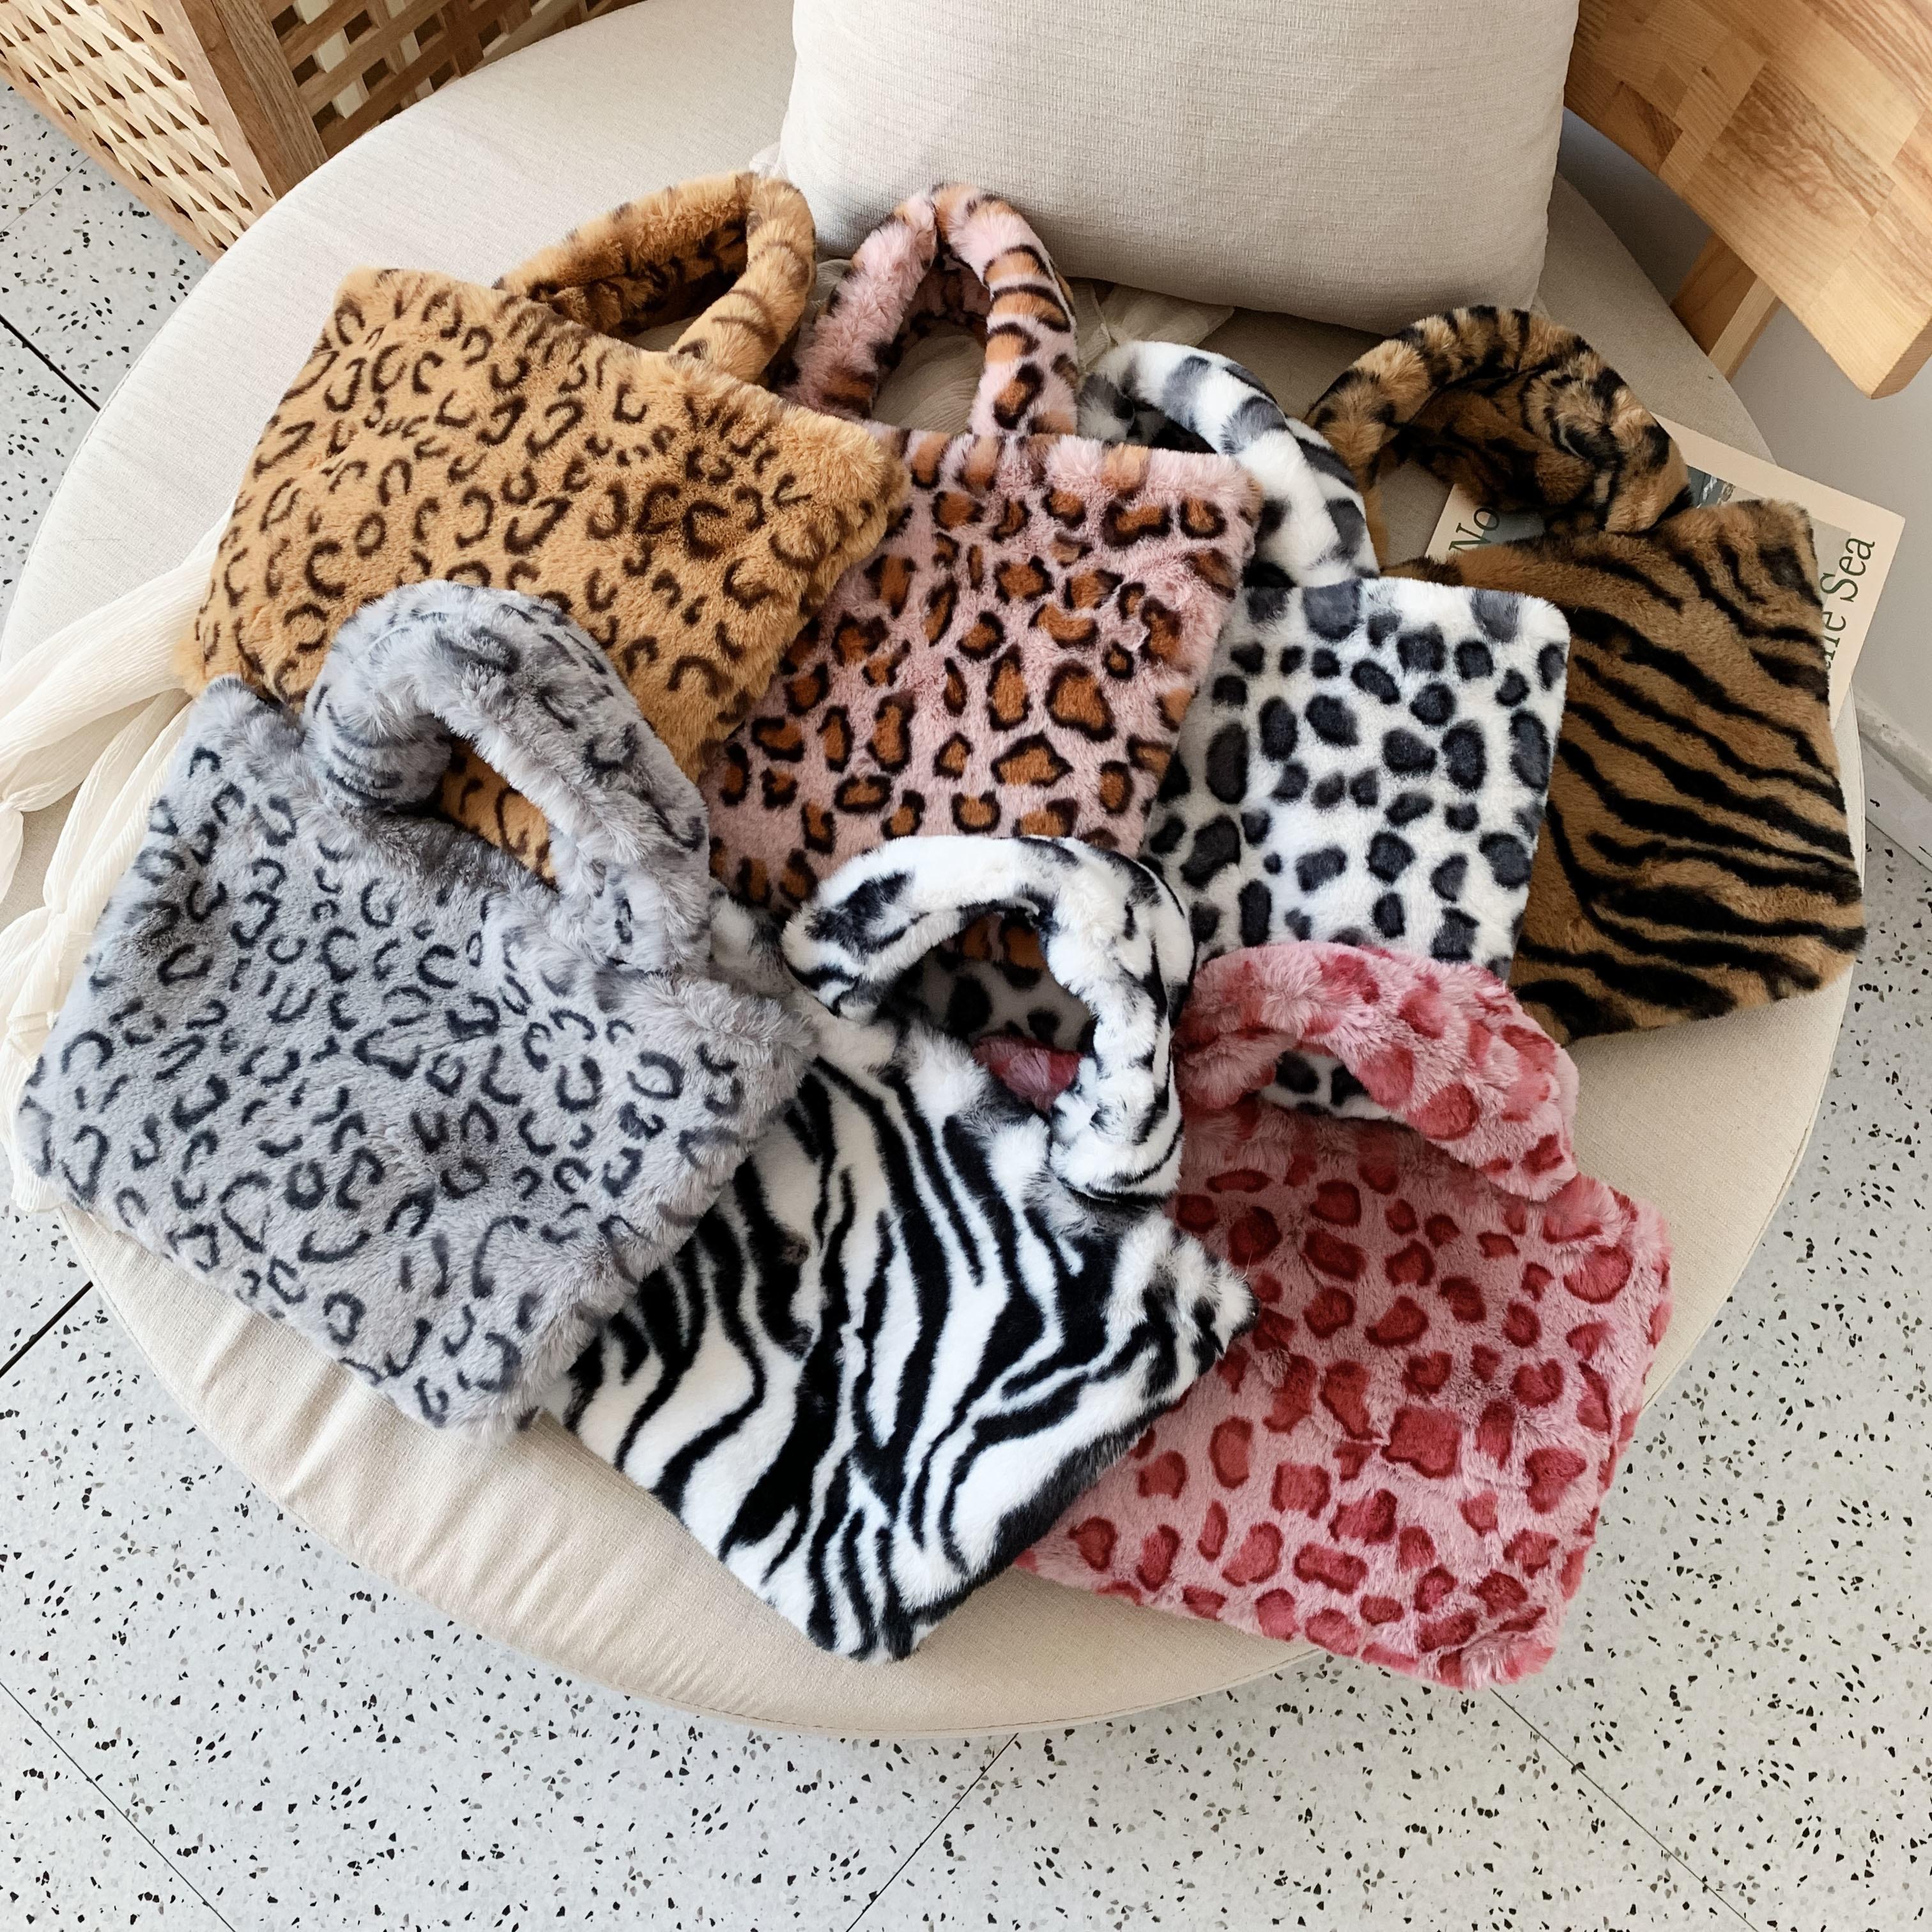 Female-Bag-Chain Fur-Bag Winter Handbag Leopard Large Plush New-Fashion Soft Warm